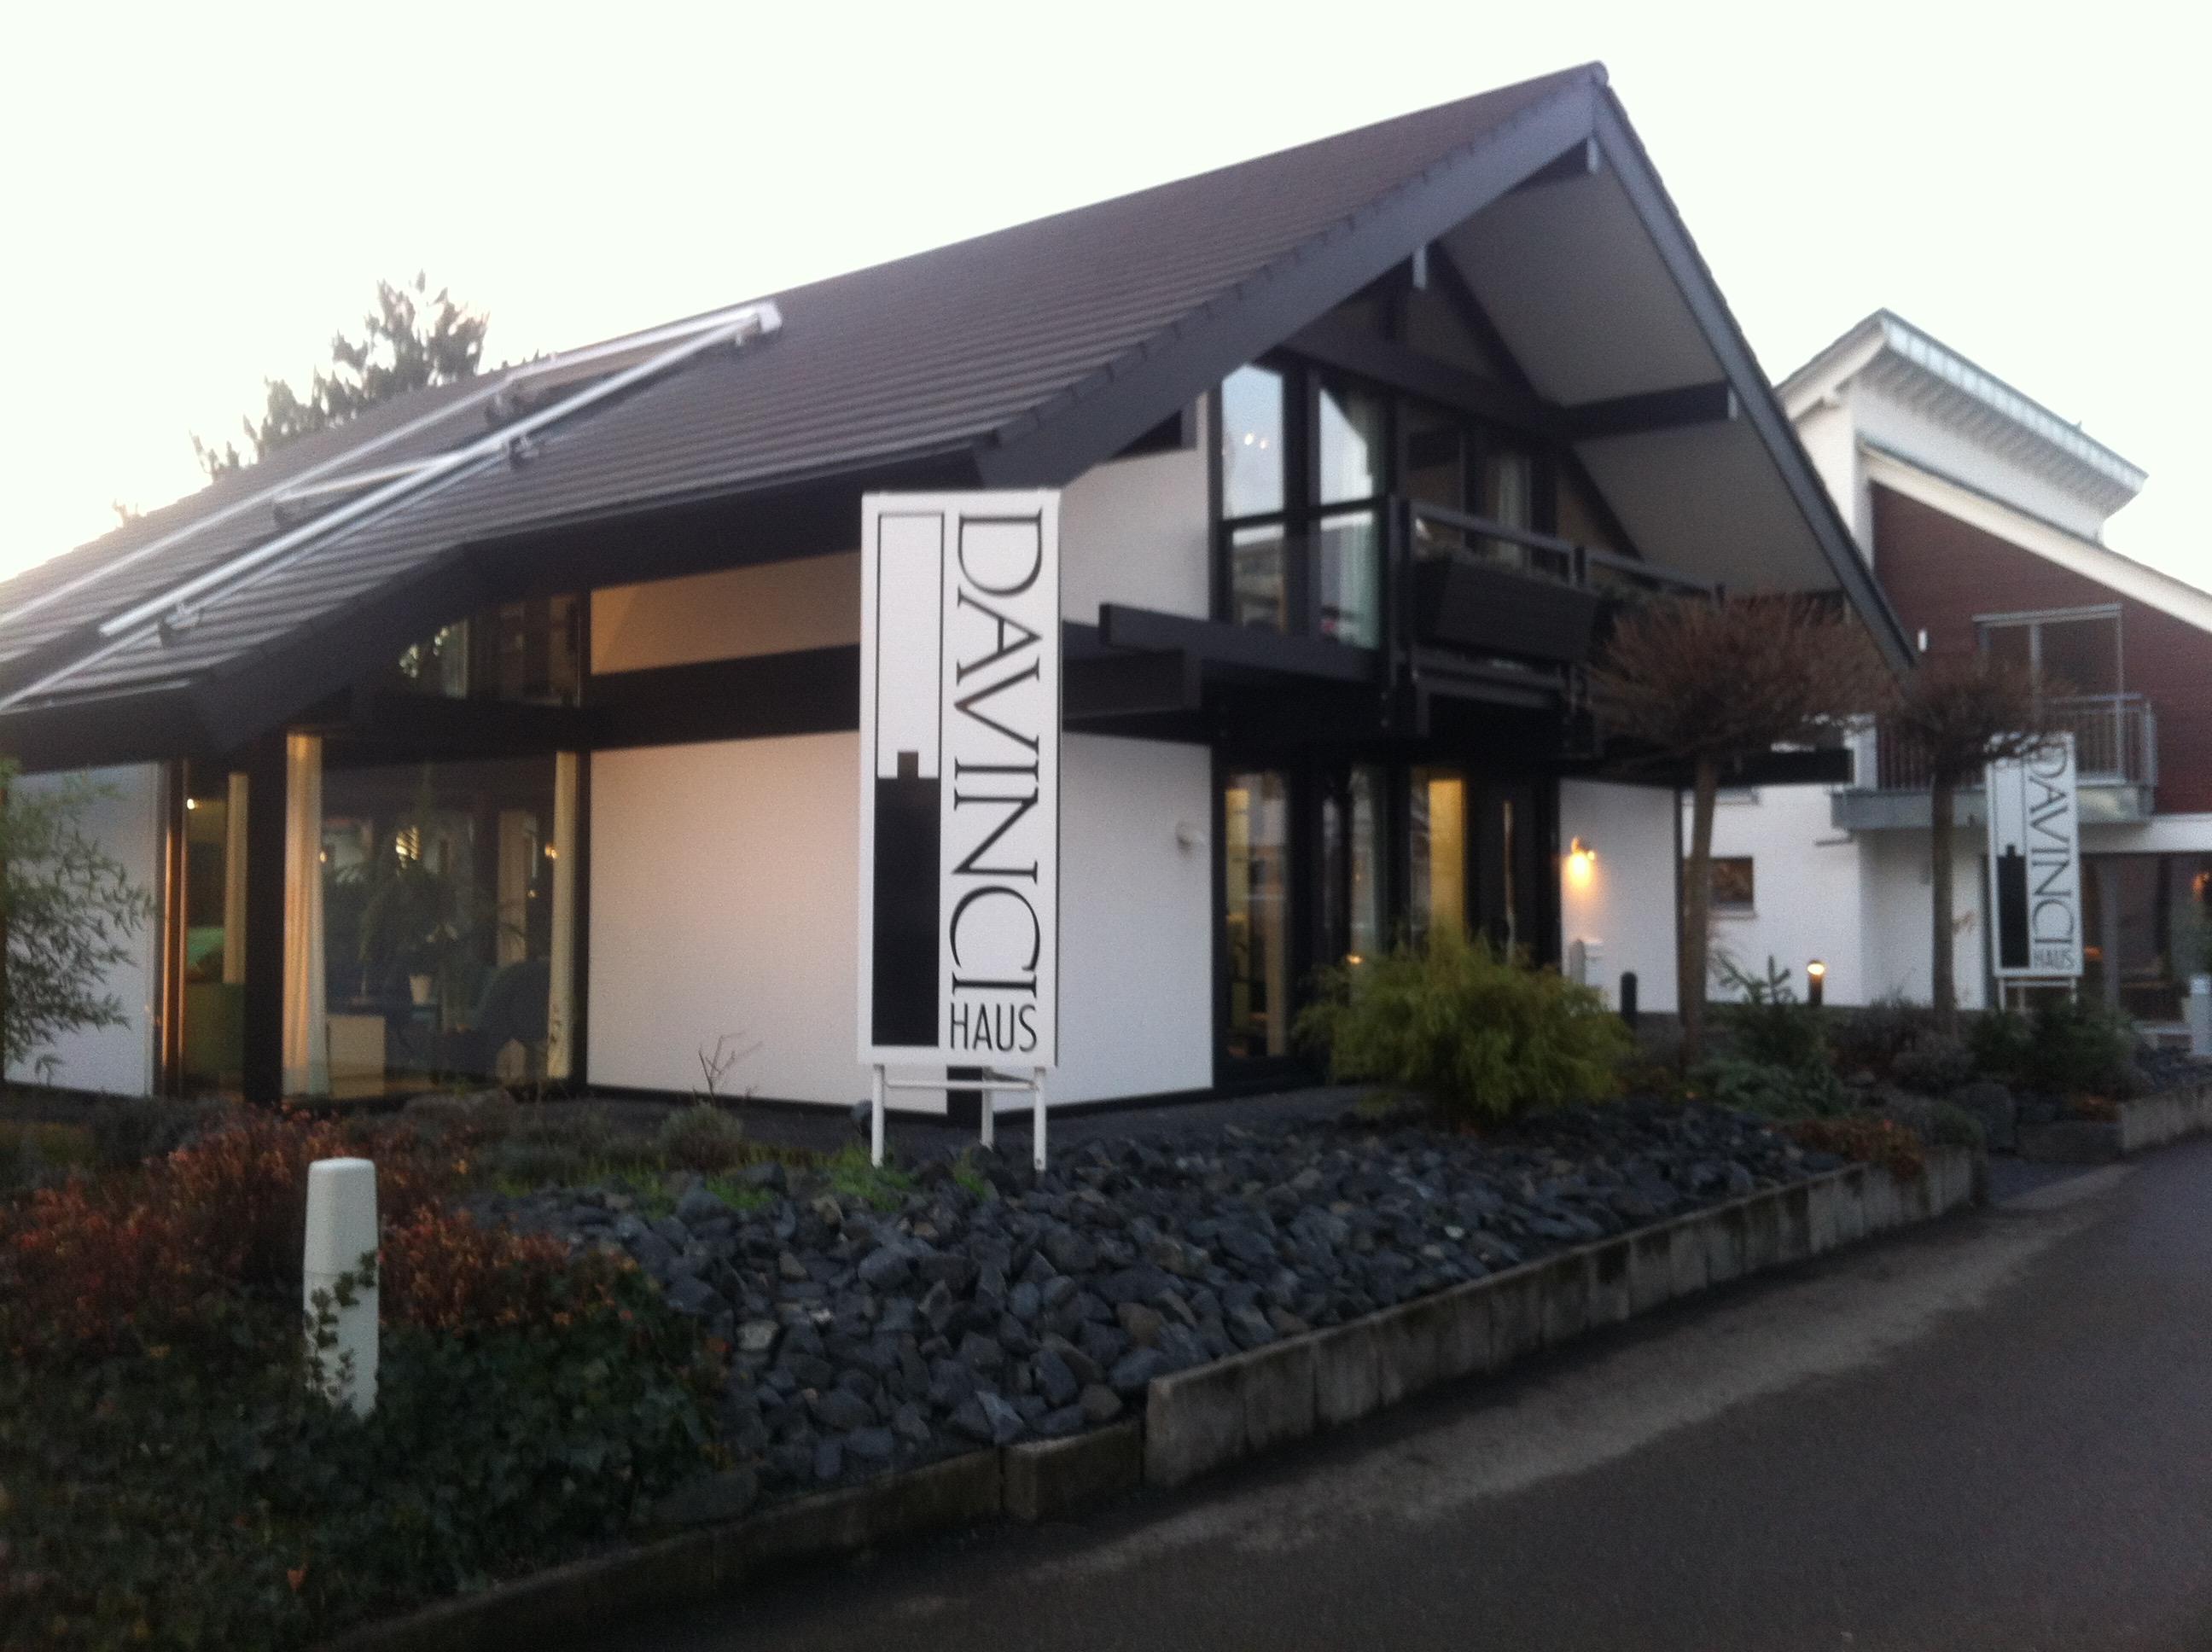 DaVinci Haus Fellbach – 1 | Bauatelier W3